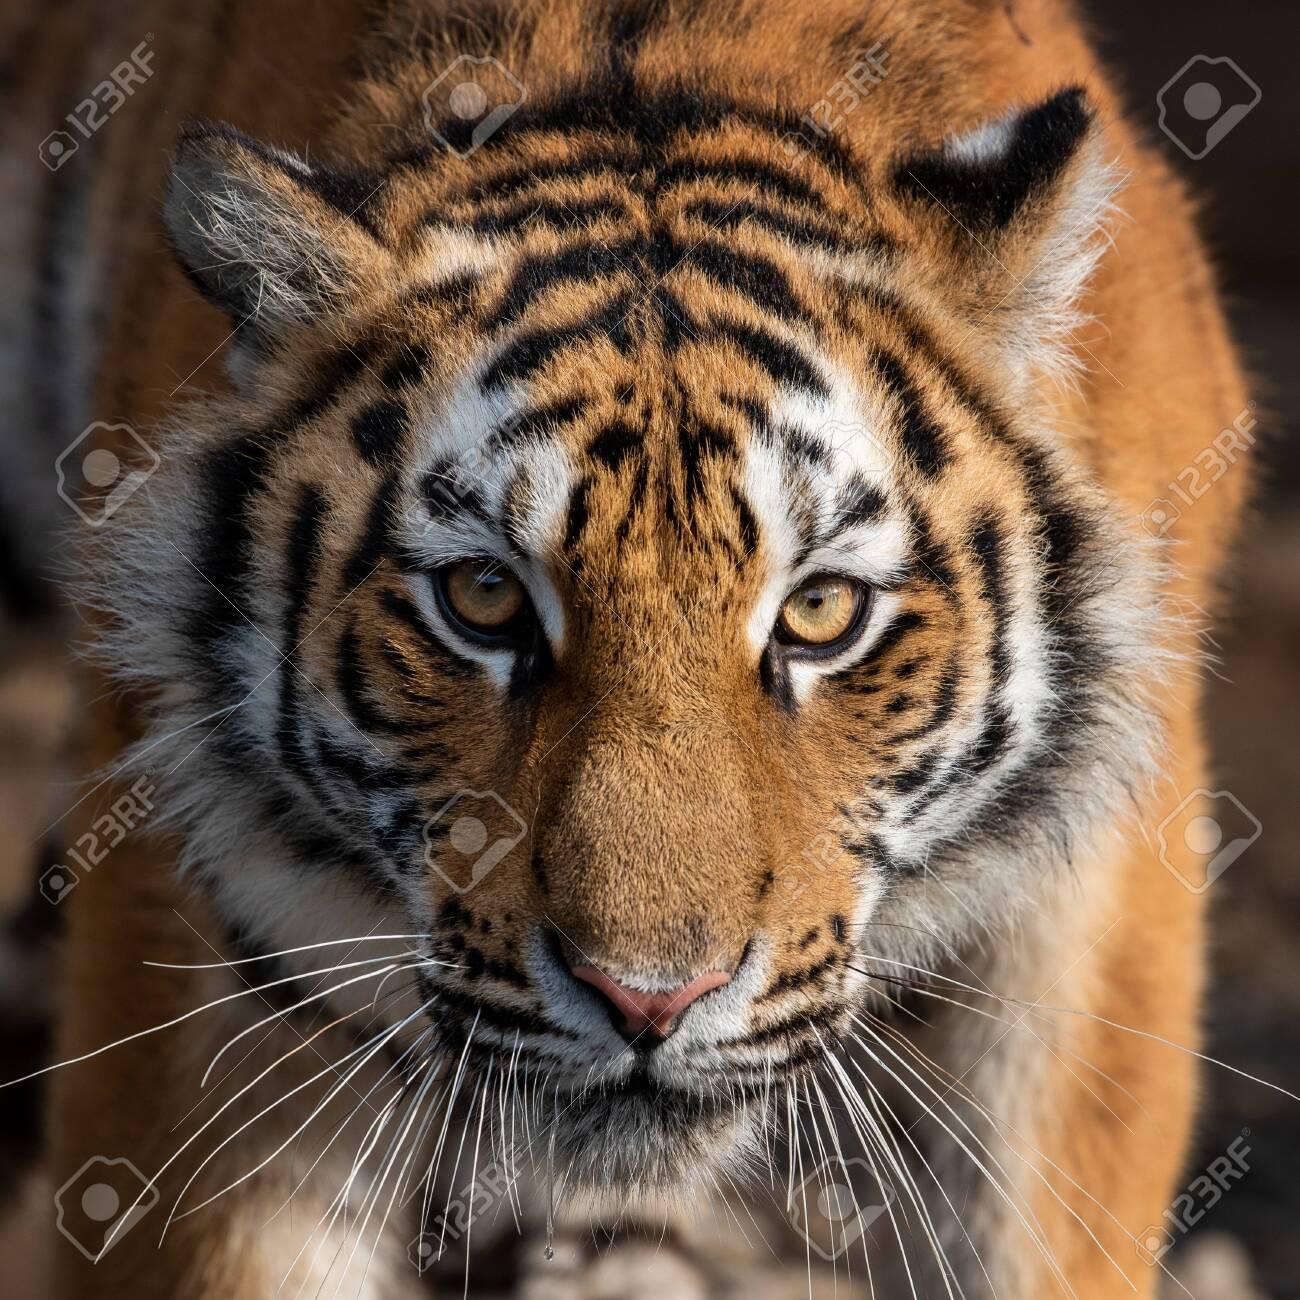 Close up view portrait of a Siberian tiger (Panthera tigris altaica) - 133253783